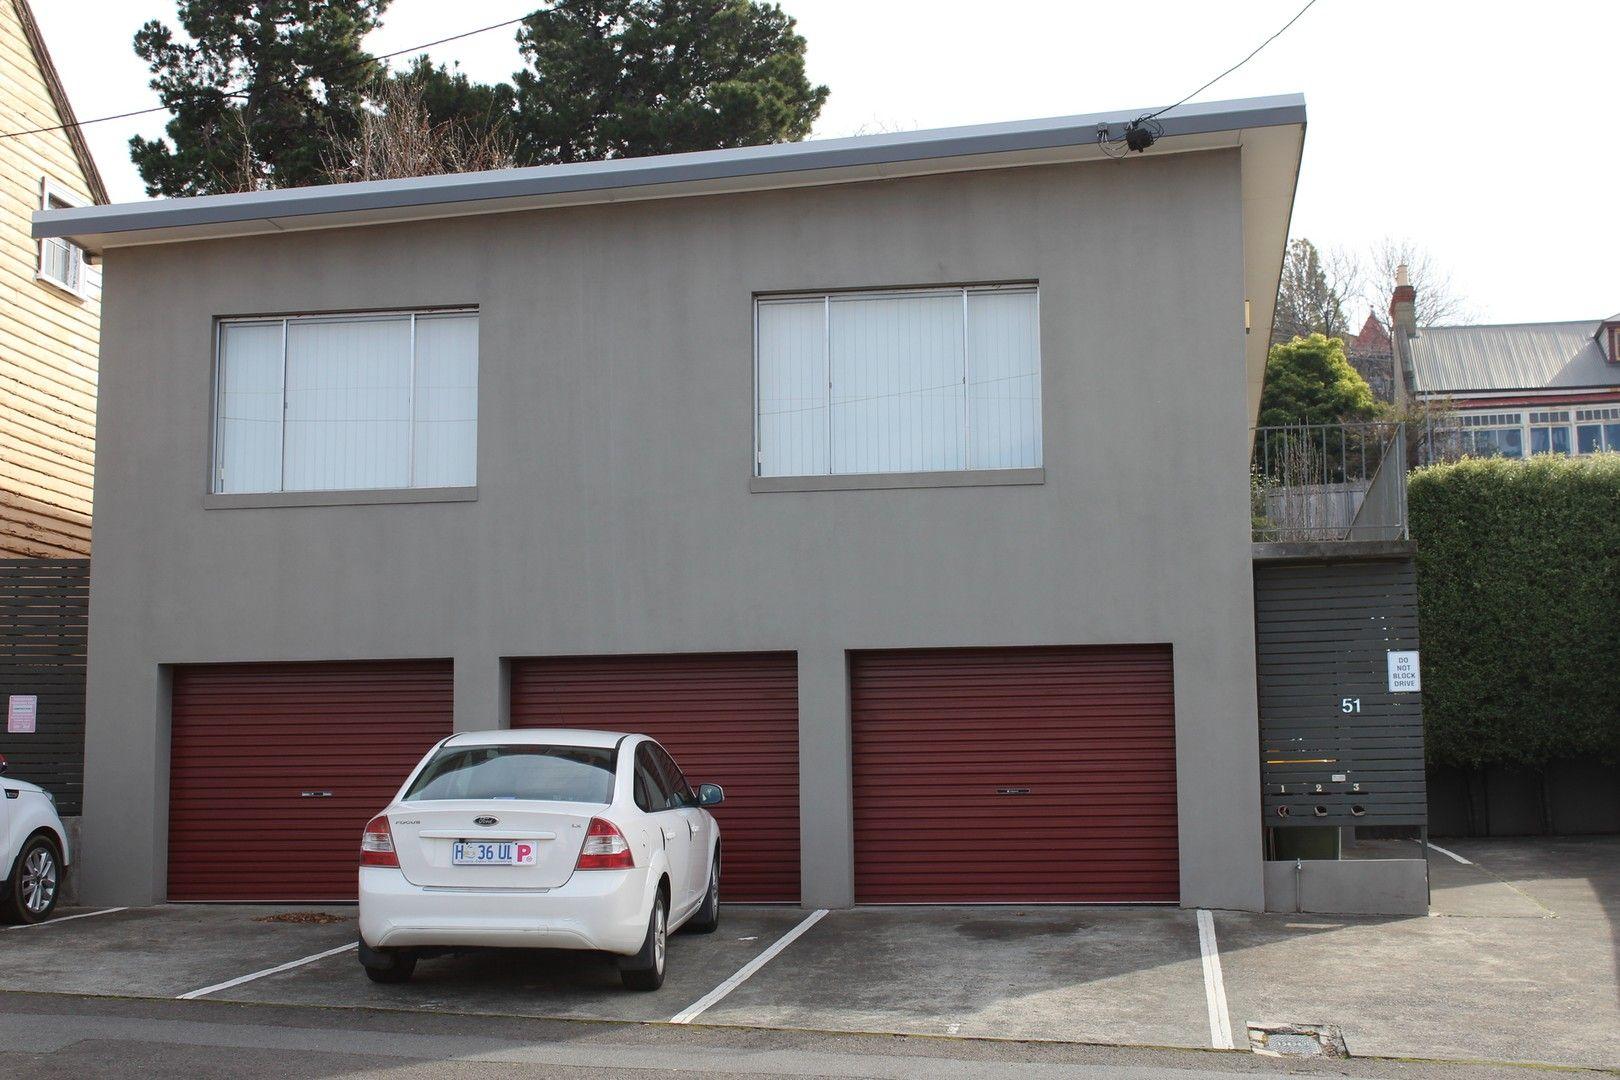 2 bedrooms Apartment / Unit / Flat in 1/51 Goulburn Street HOBART TAS, 7000